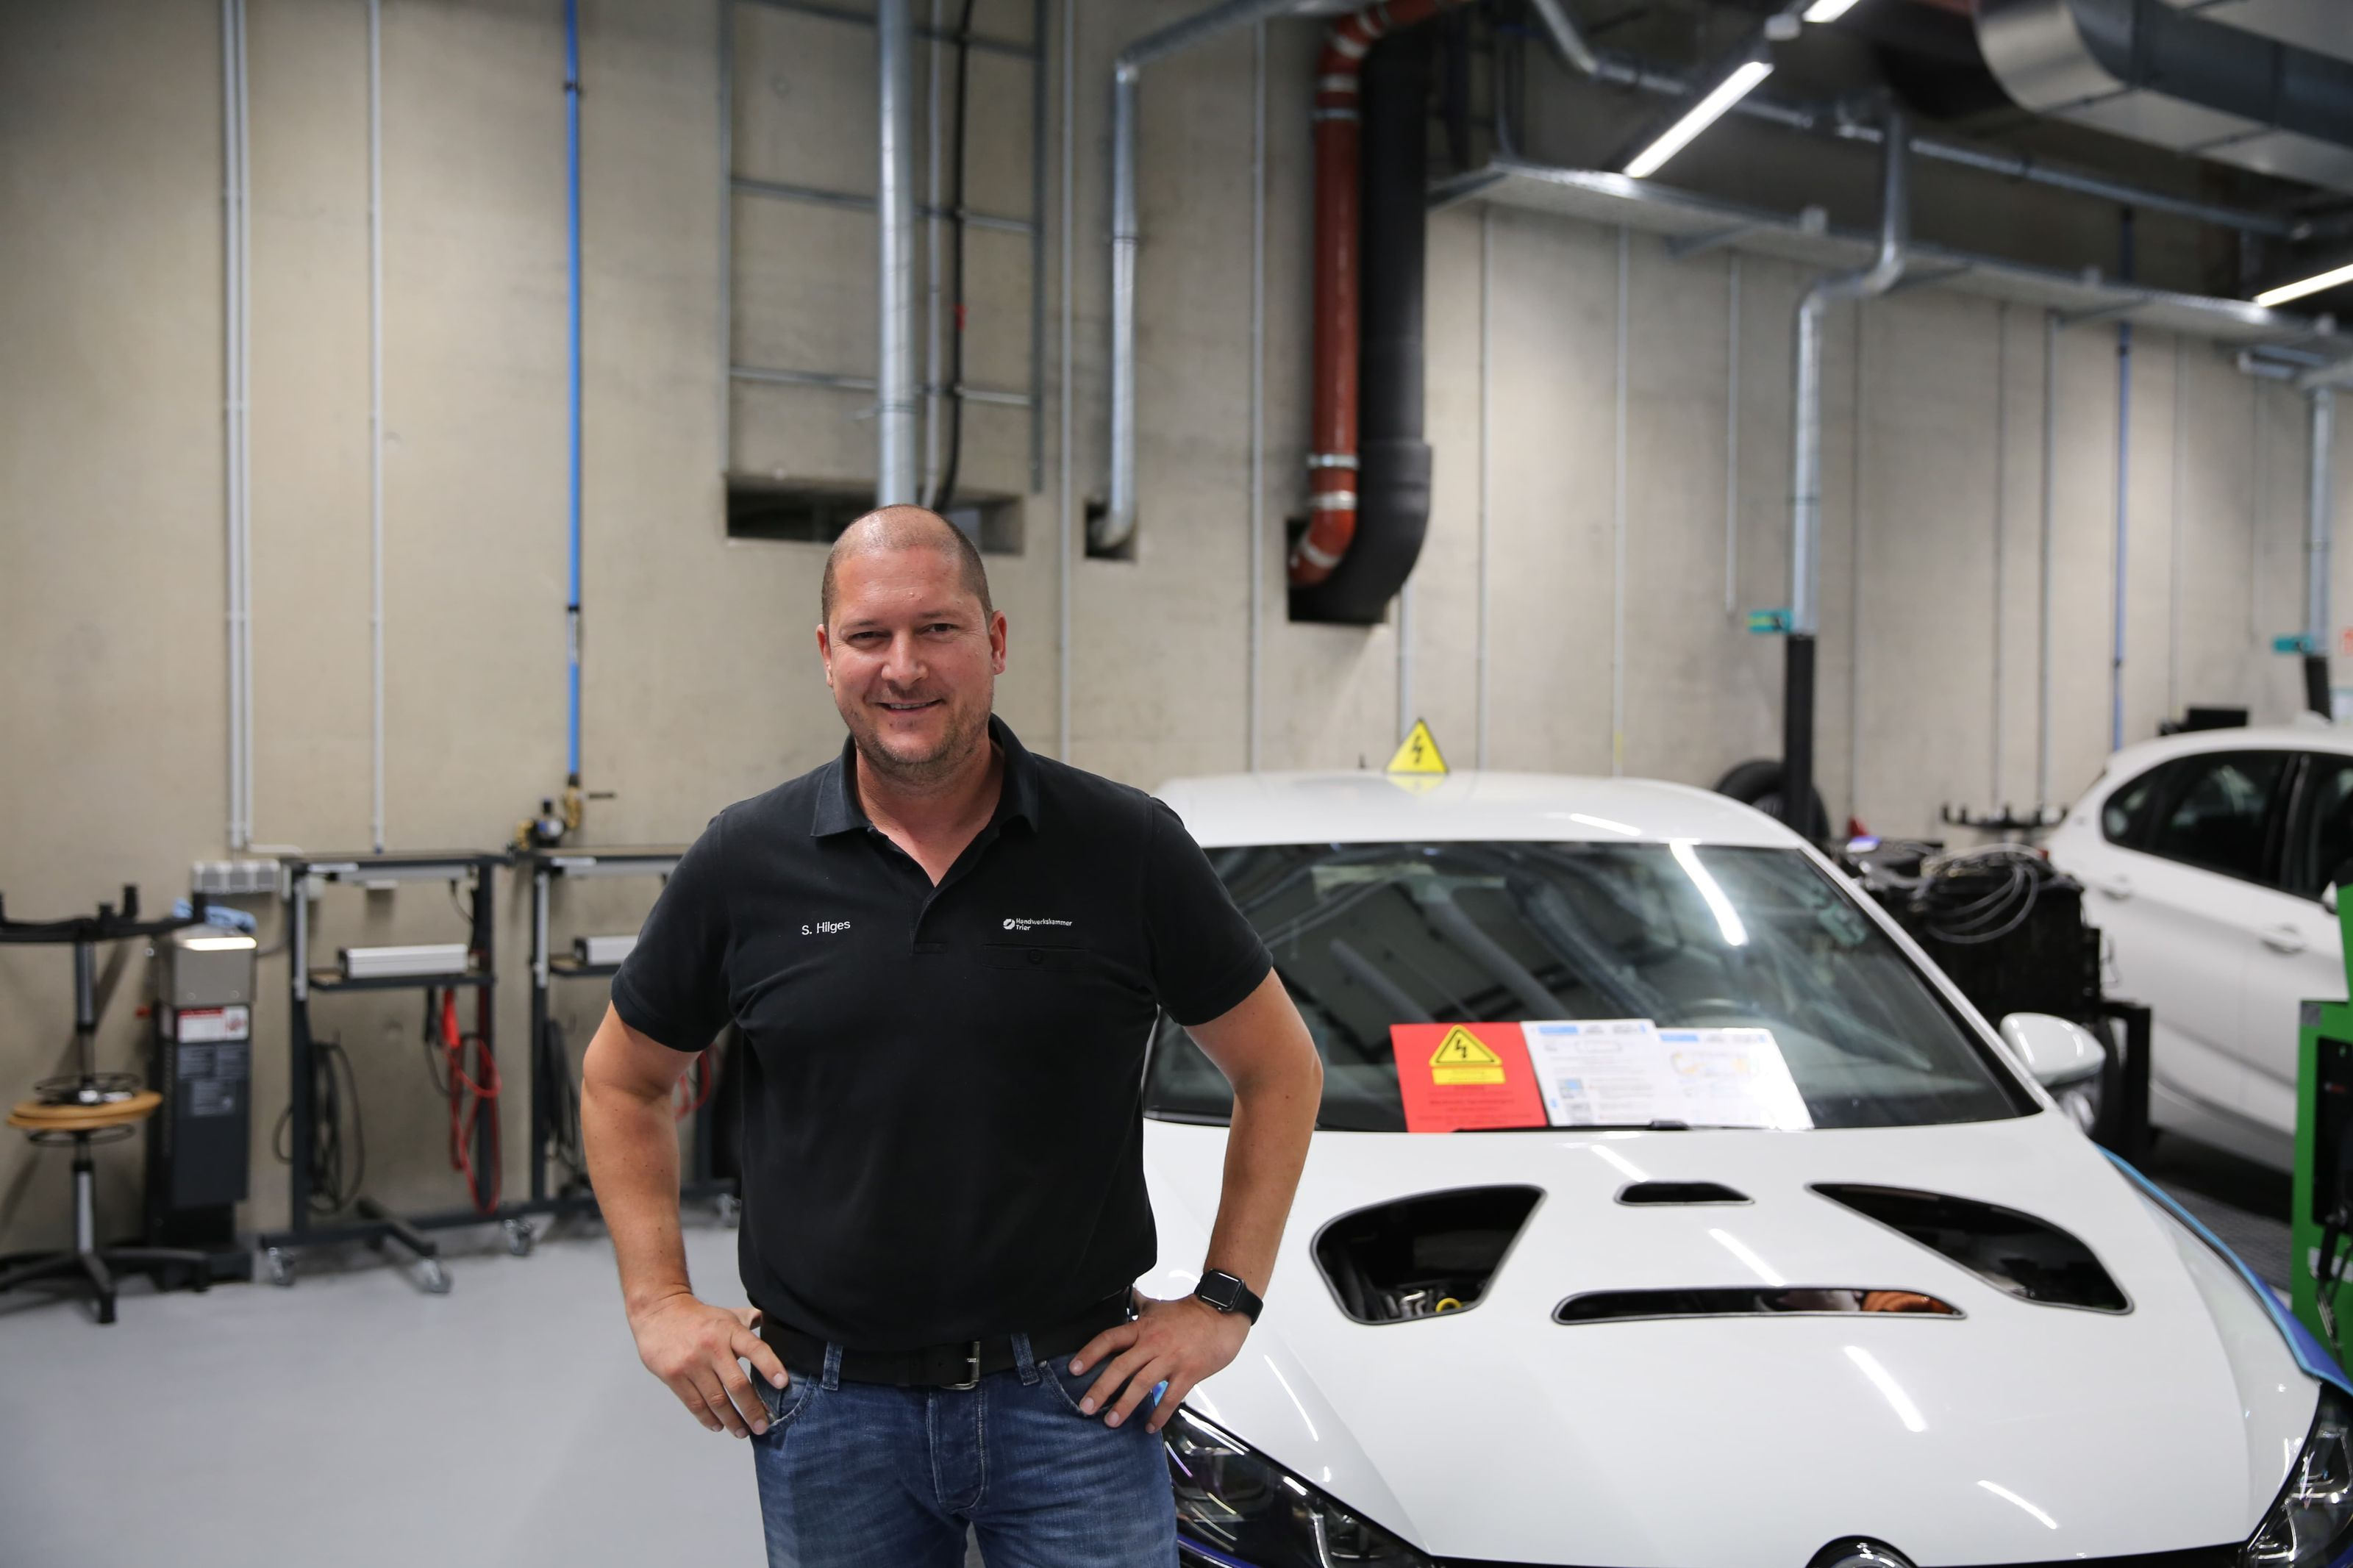 Sebastian Hilges, Ausbilder, Trainer, HWK Trier, Automotive, Kfz-Technik